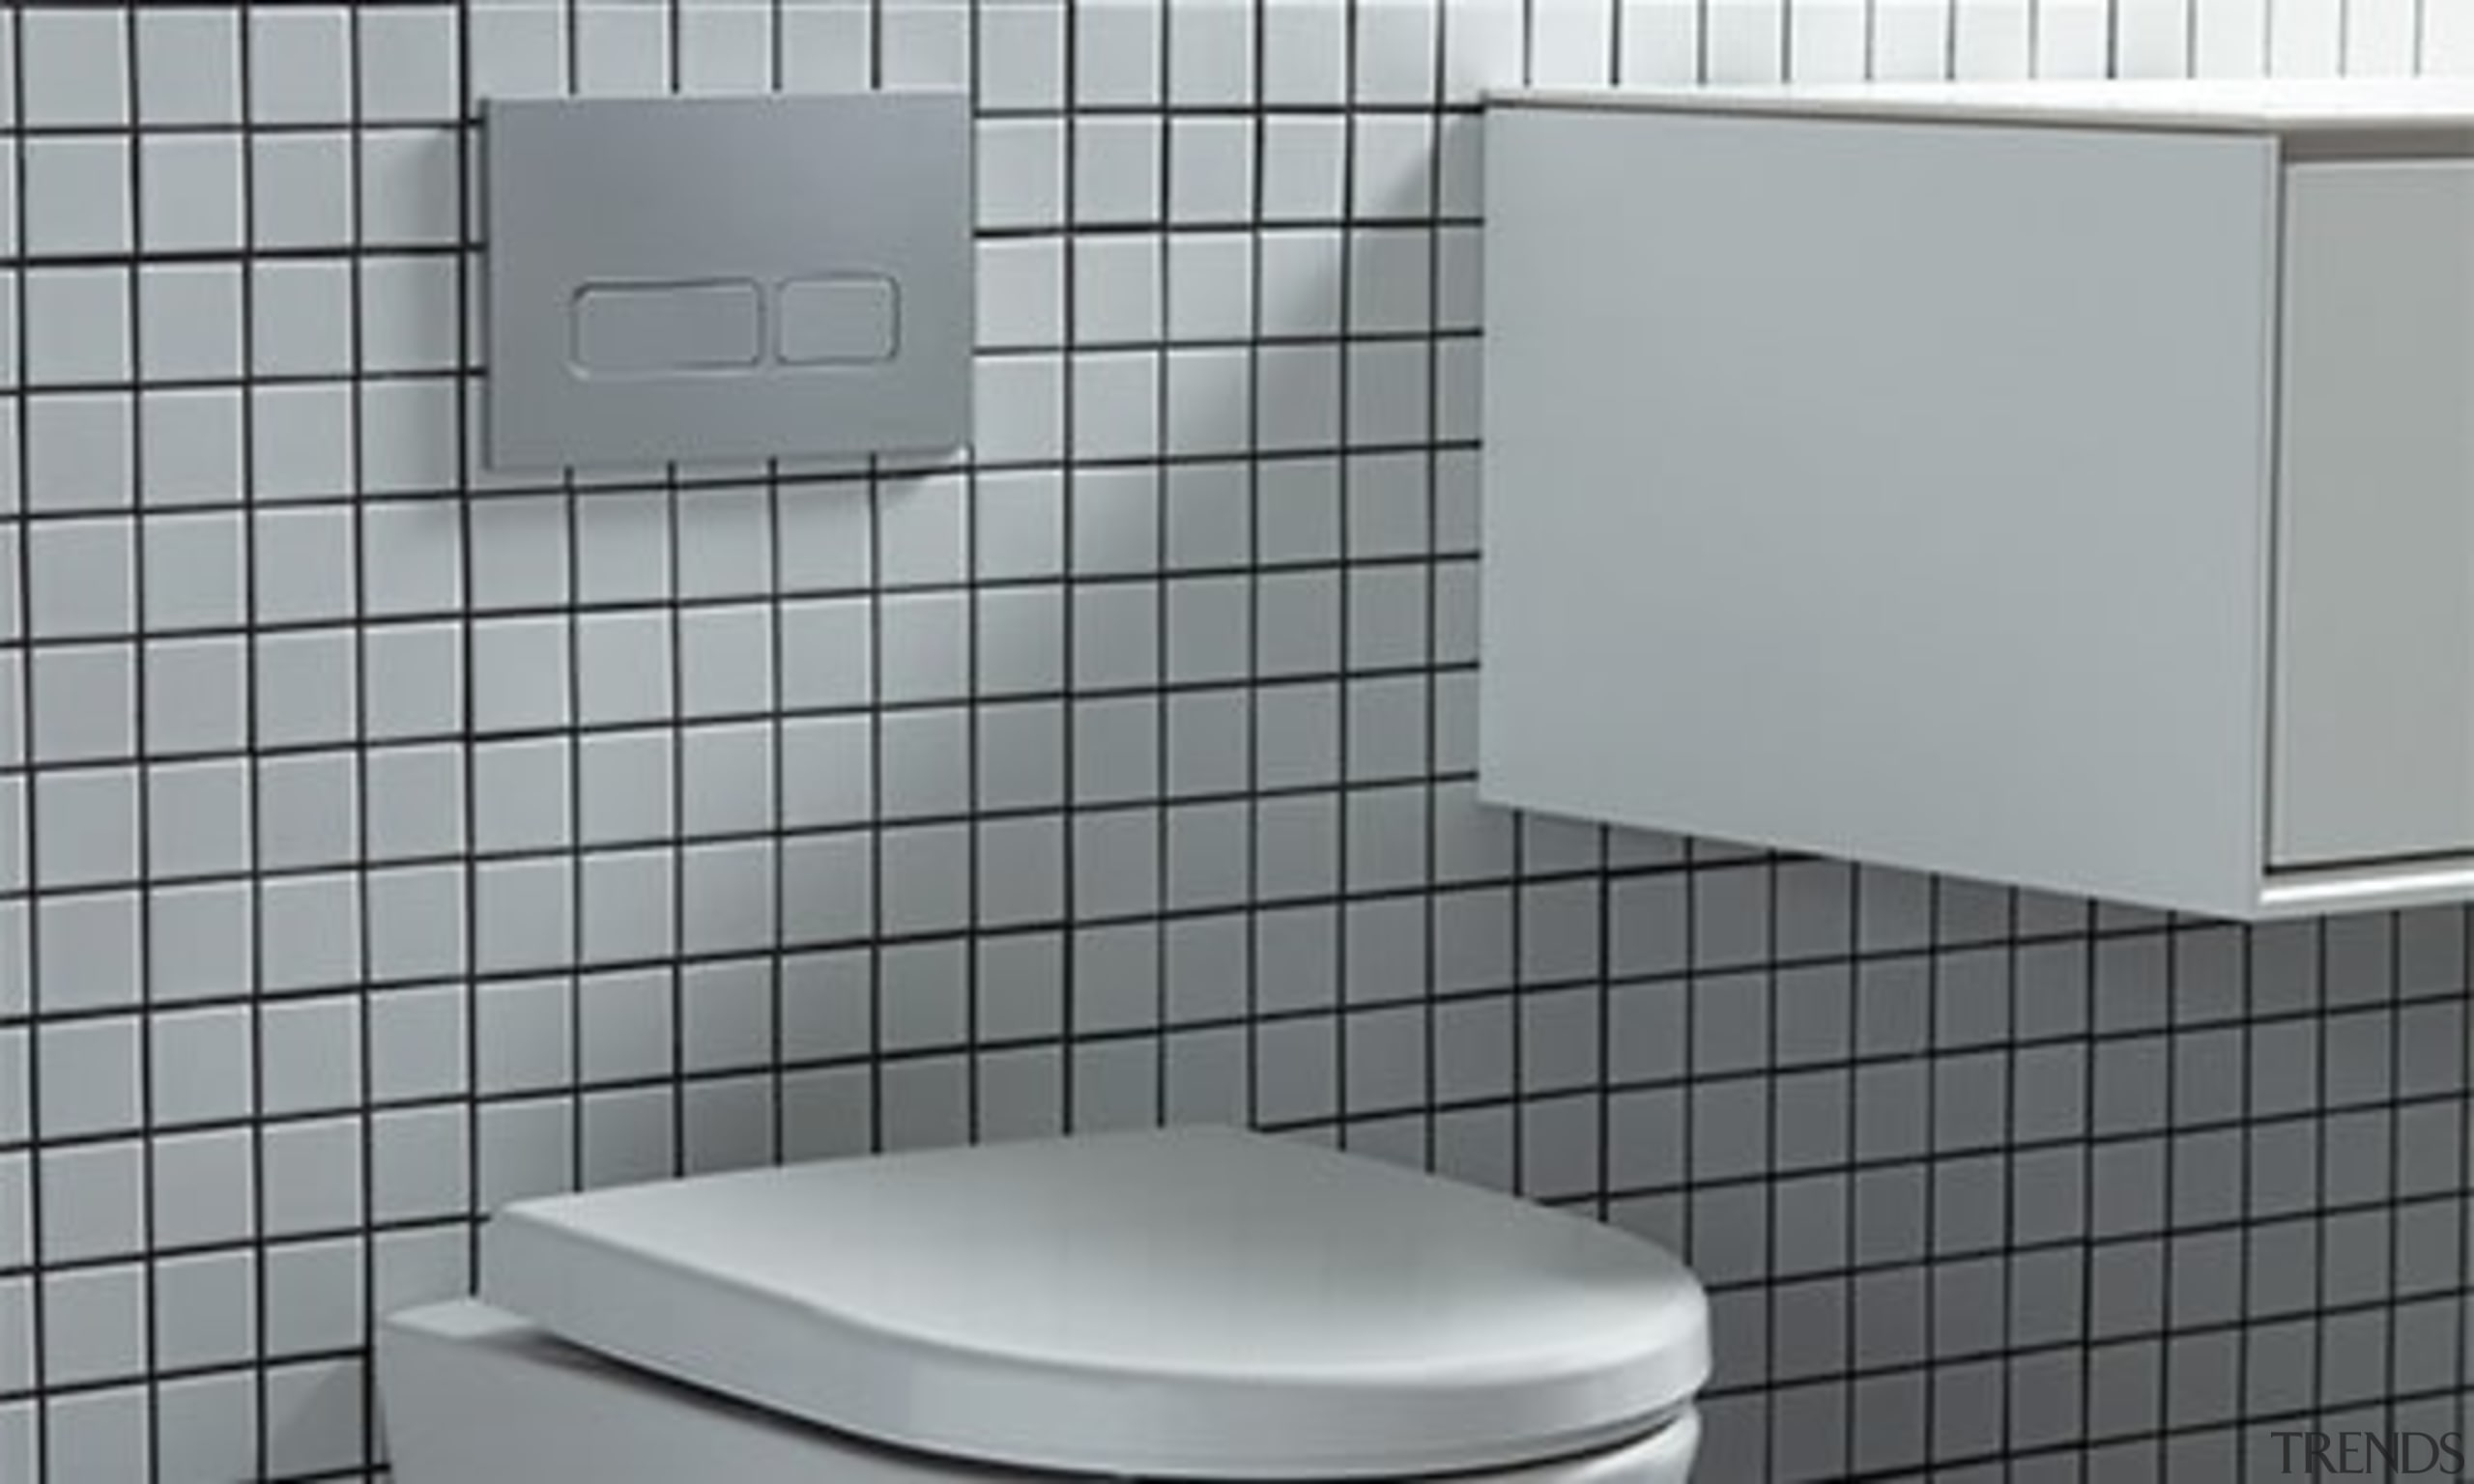 Thepowderoom Inwall Cistern Plate Silver 03 - floor floor, plumbing fixture, product, tile, toilet, gray